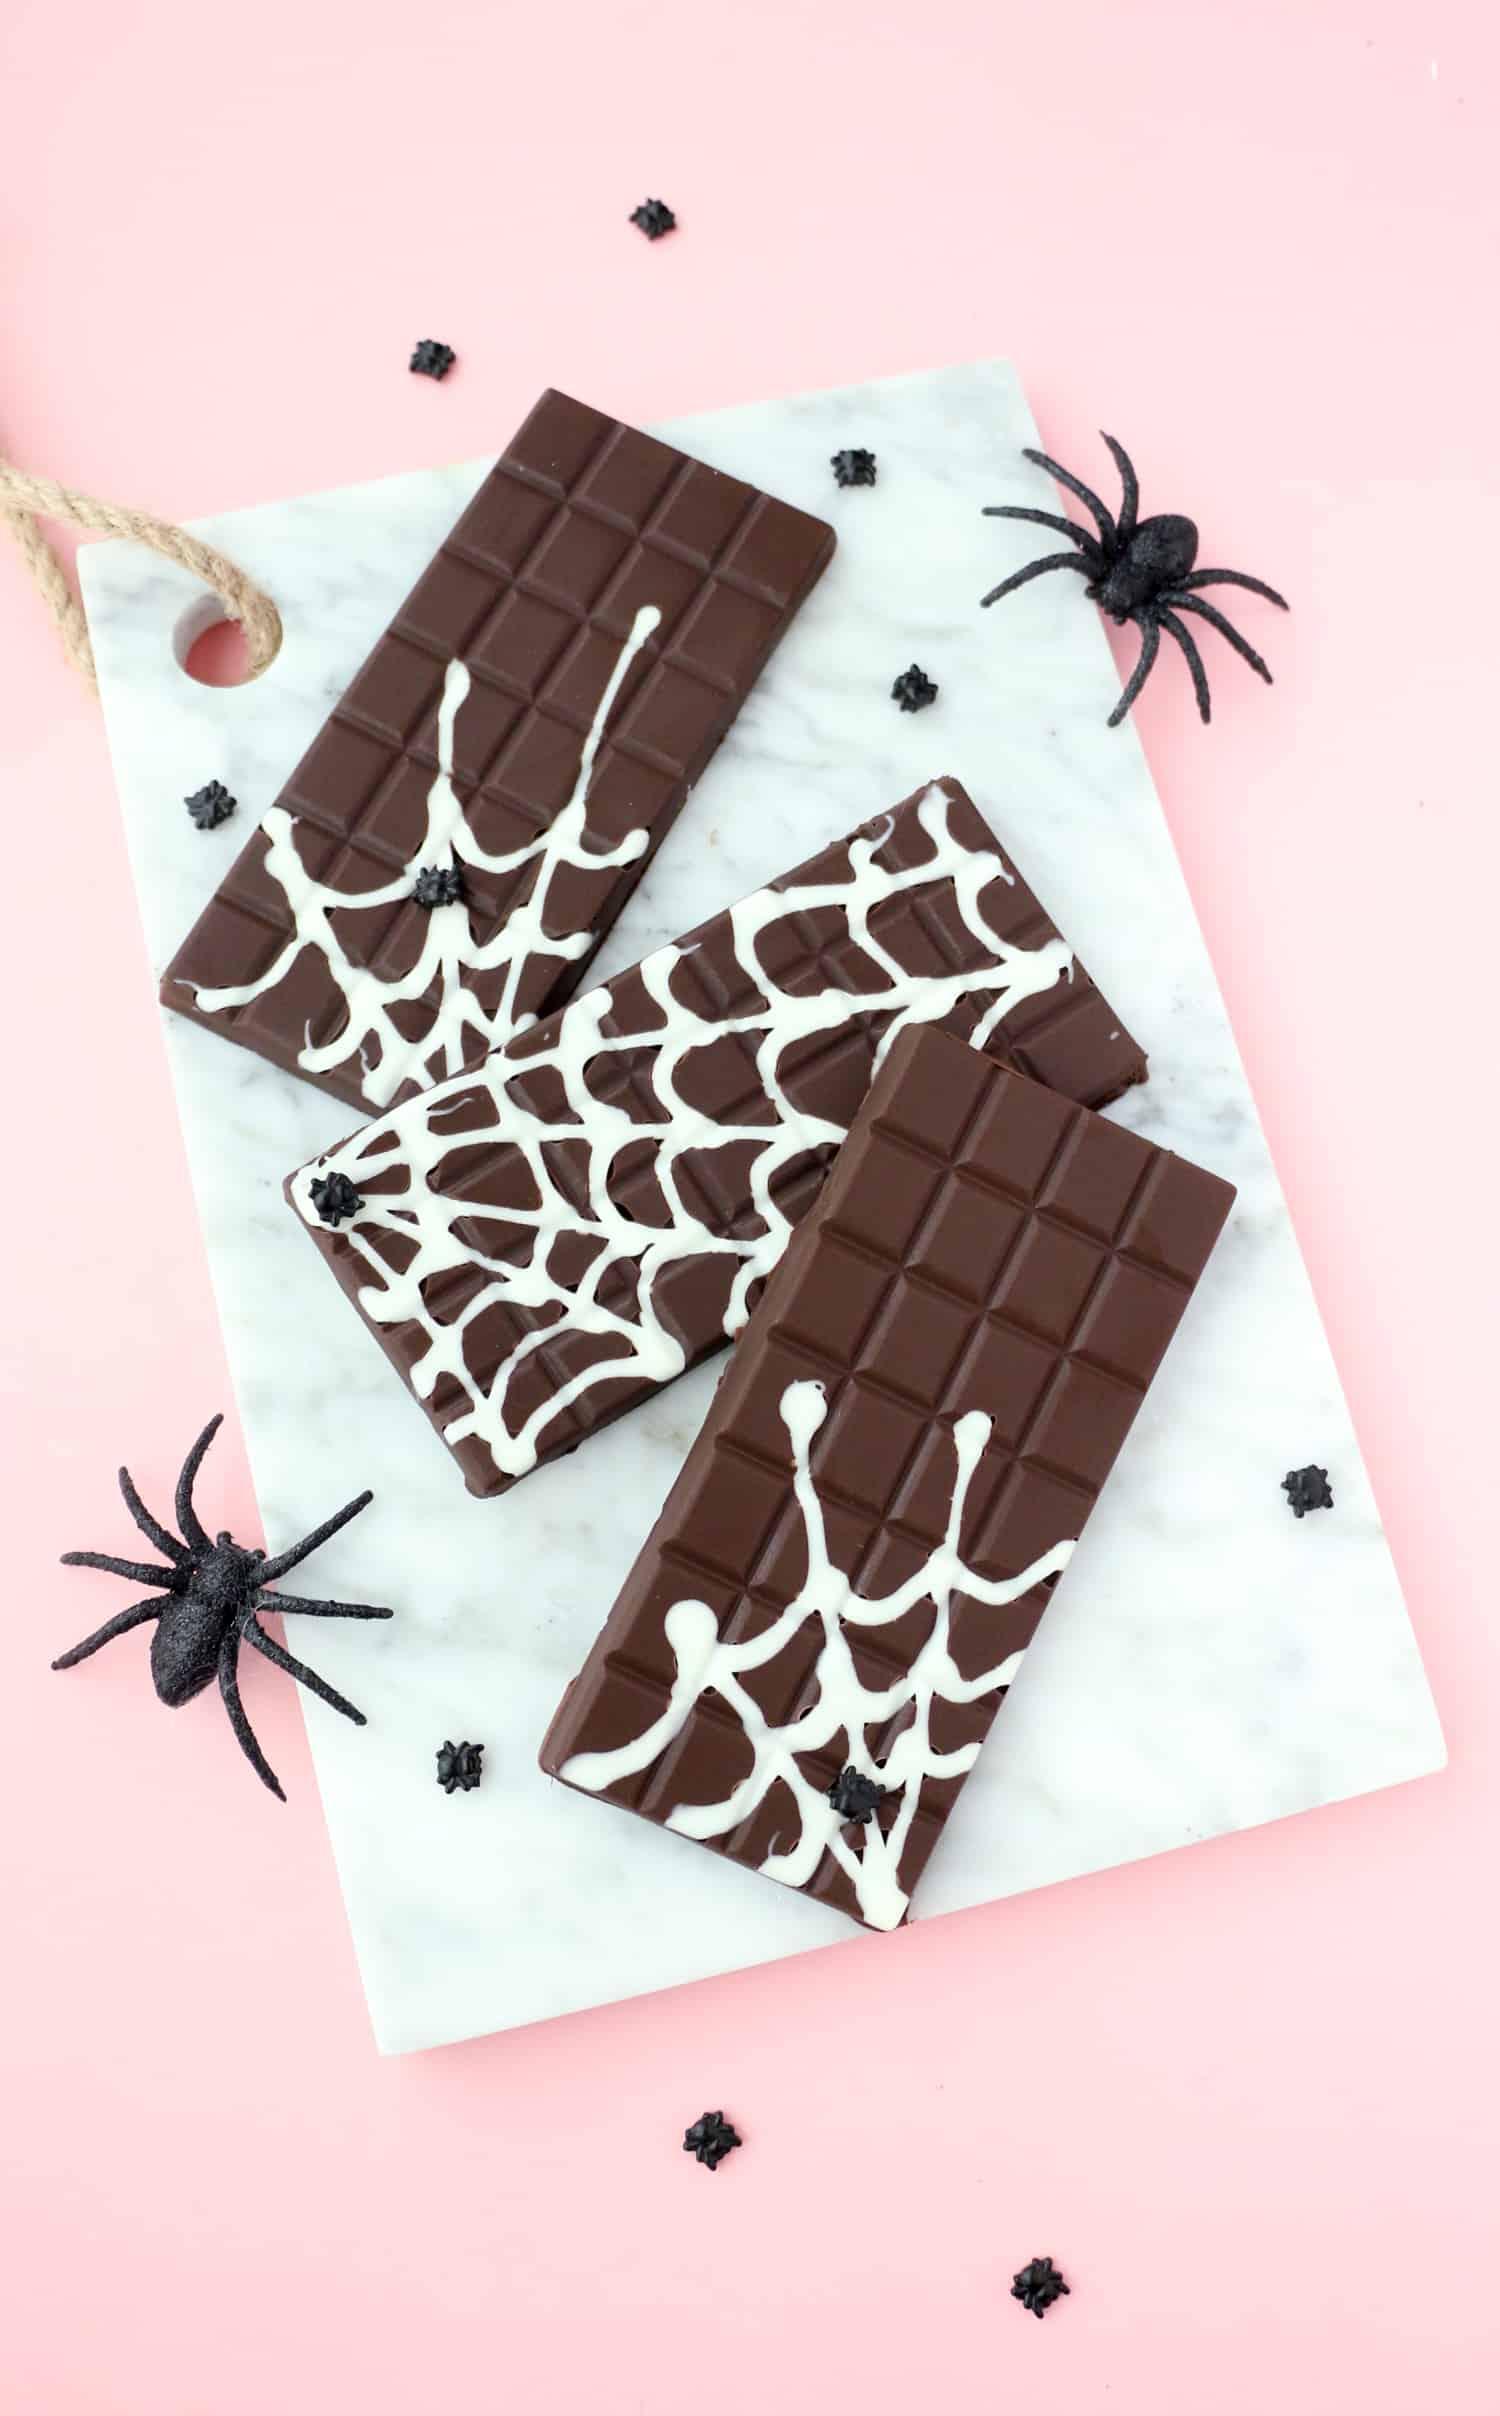 DIY-Spider-Web-Chocolate-Bars-8